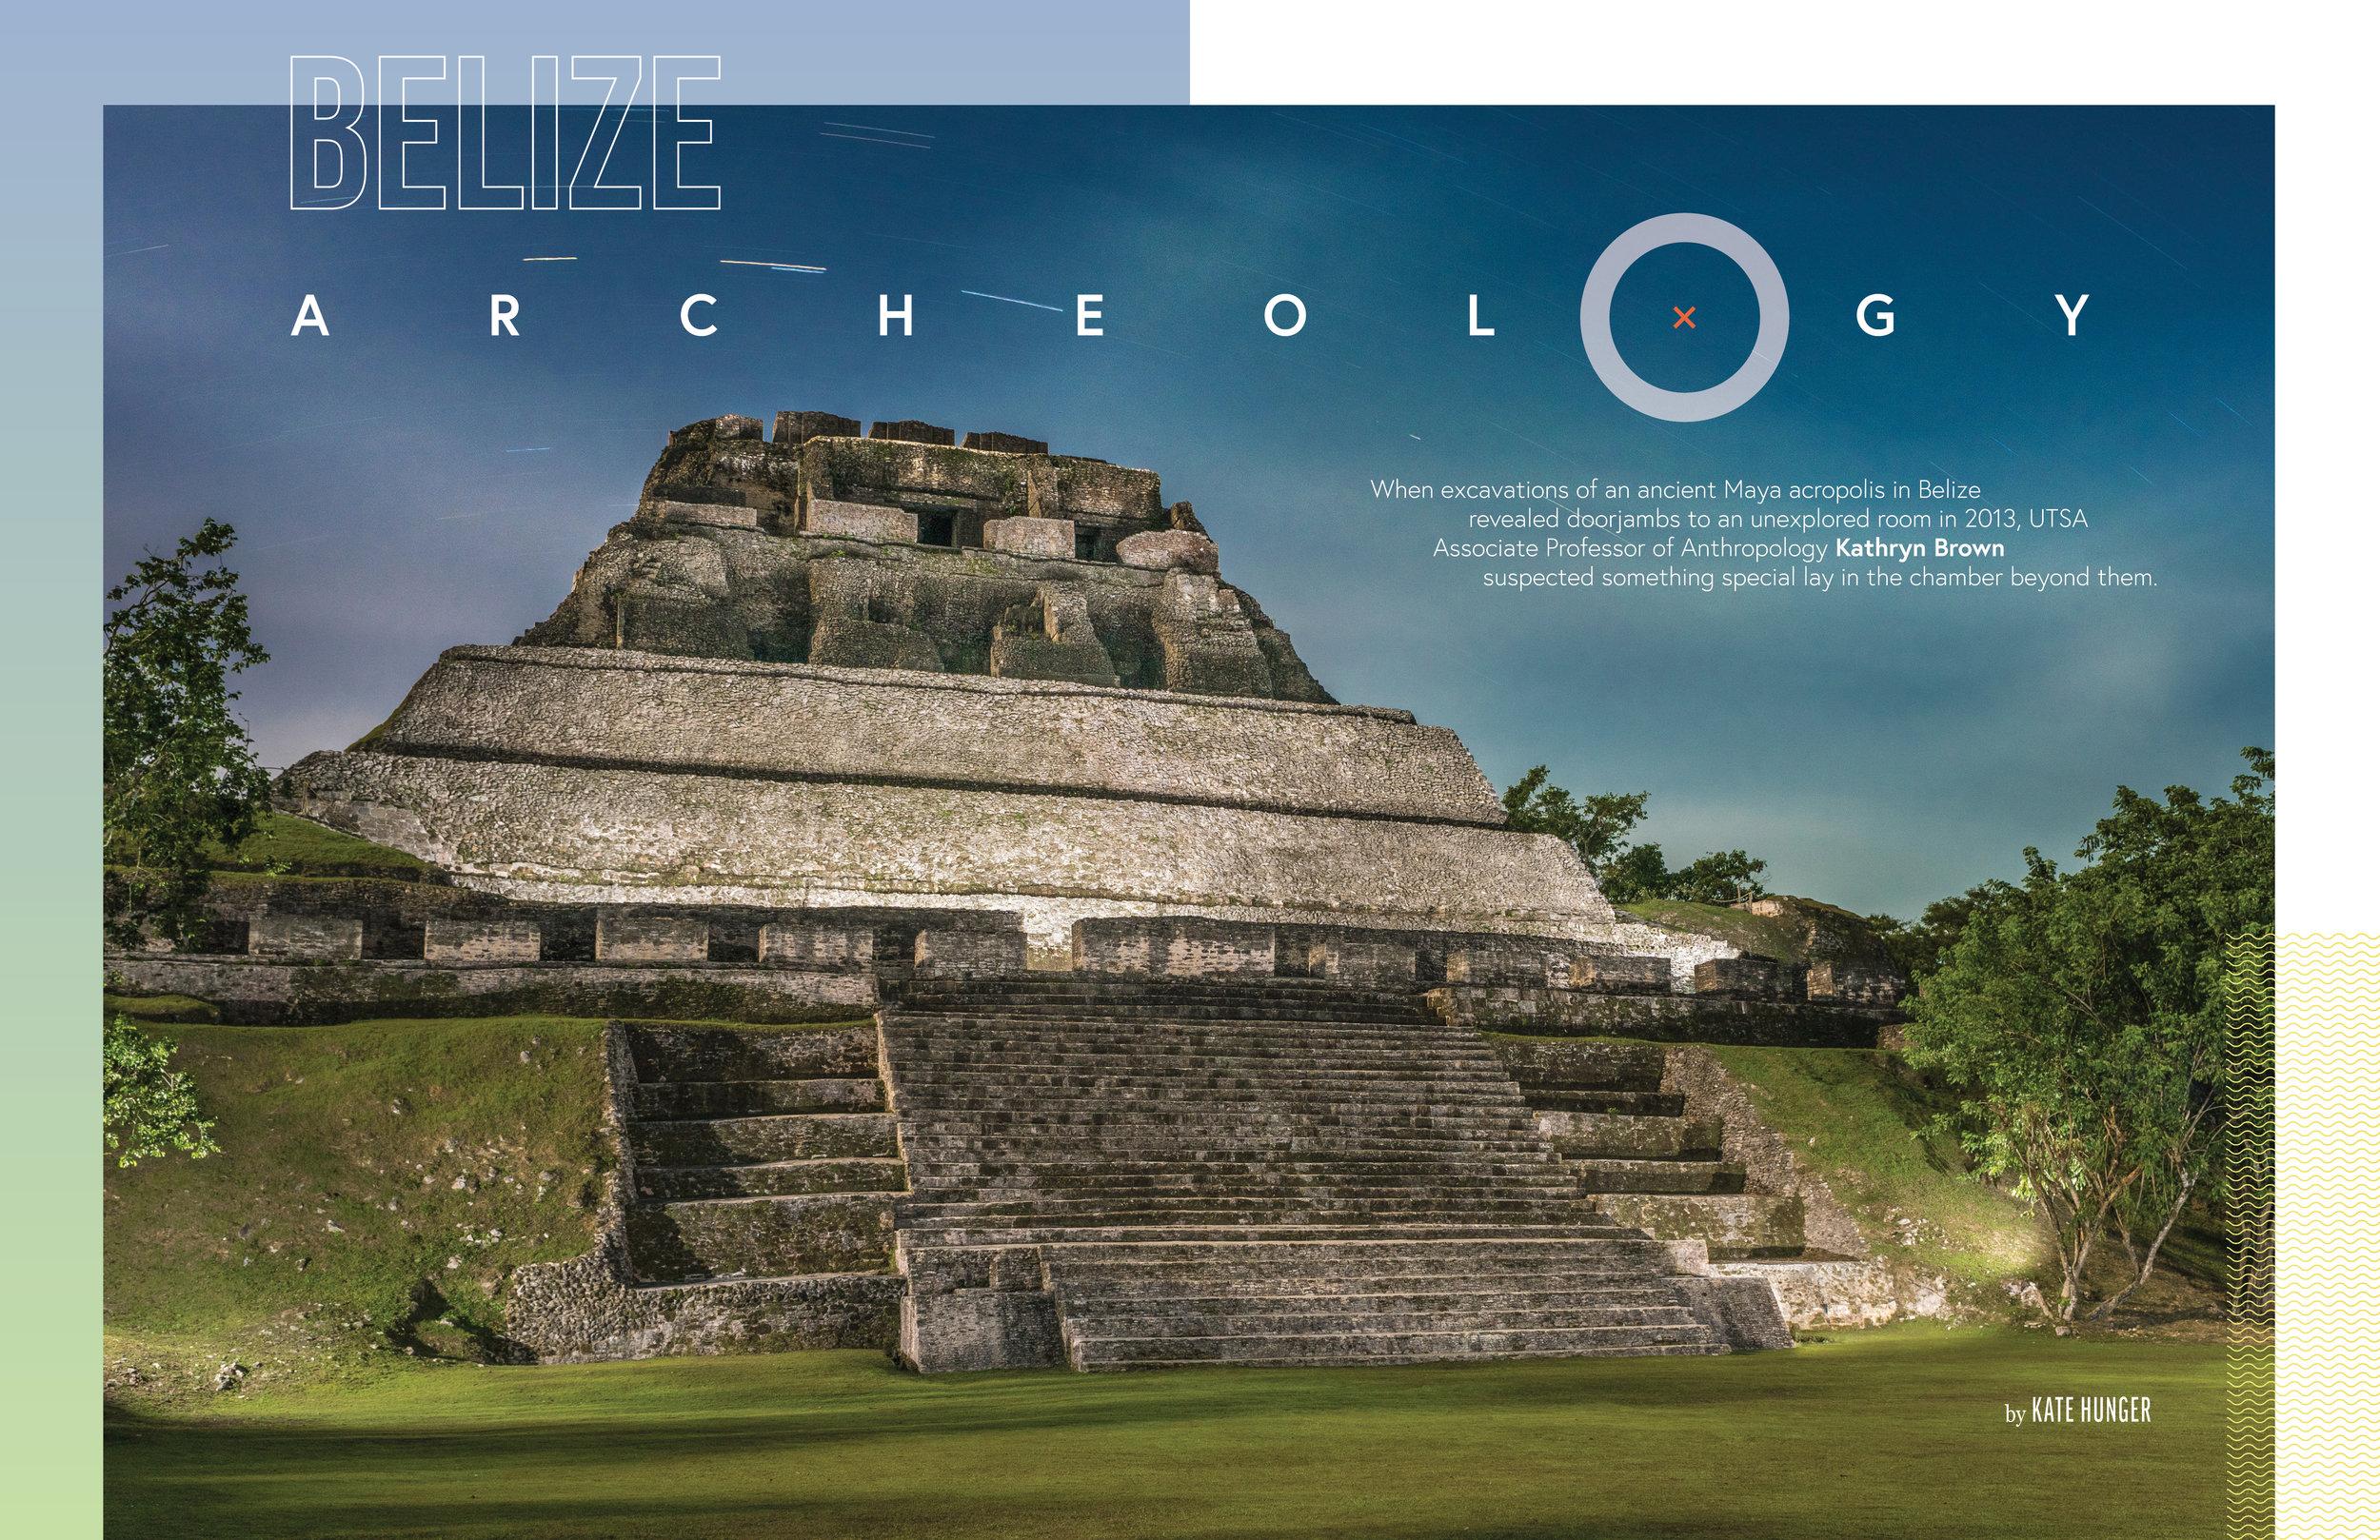 Discovery_9_Archeology.jpg